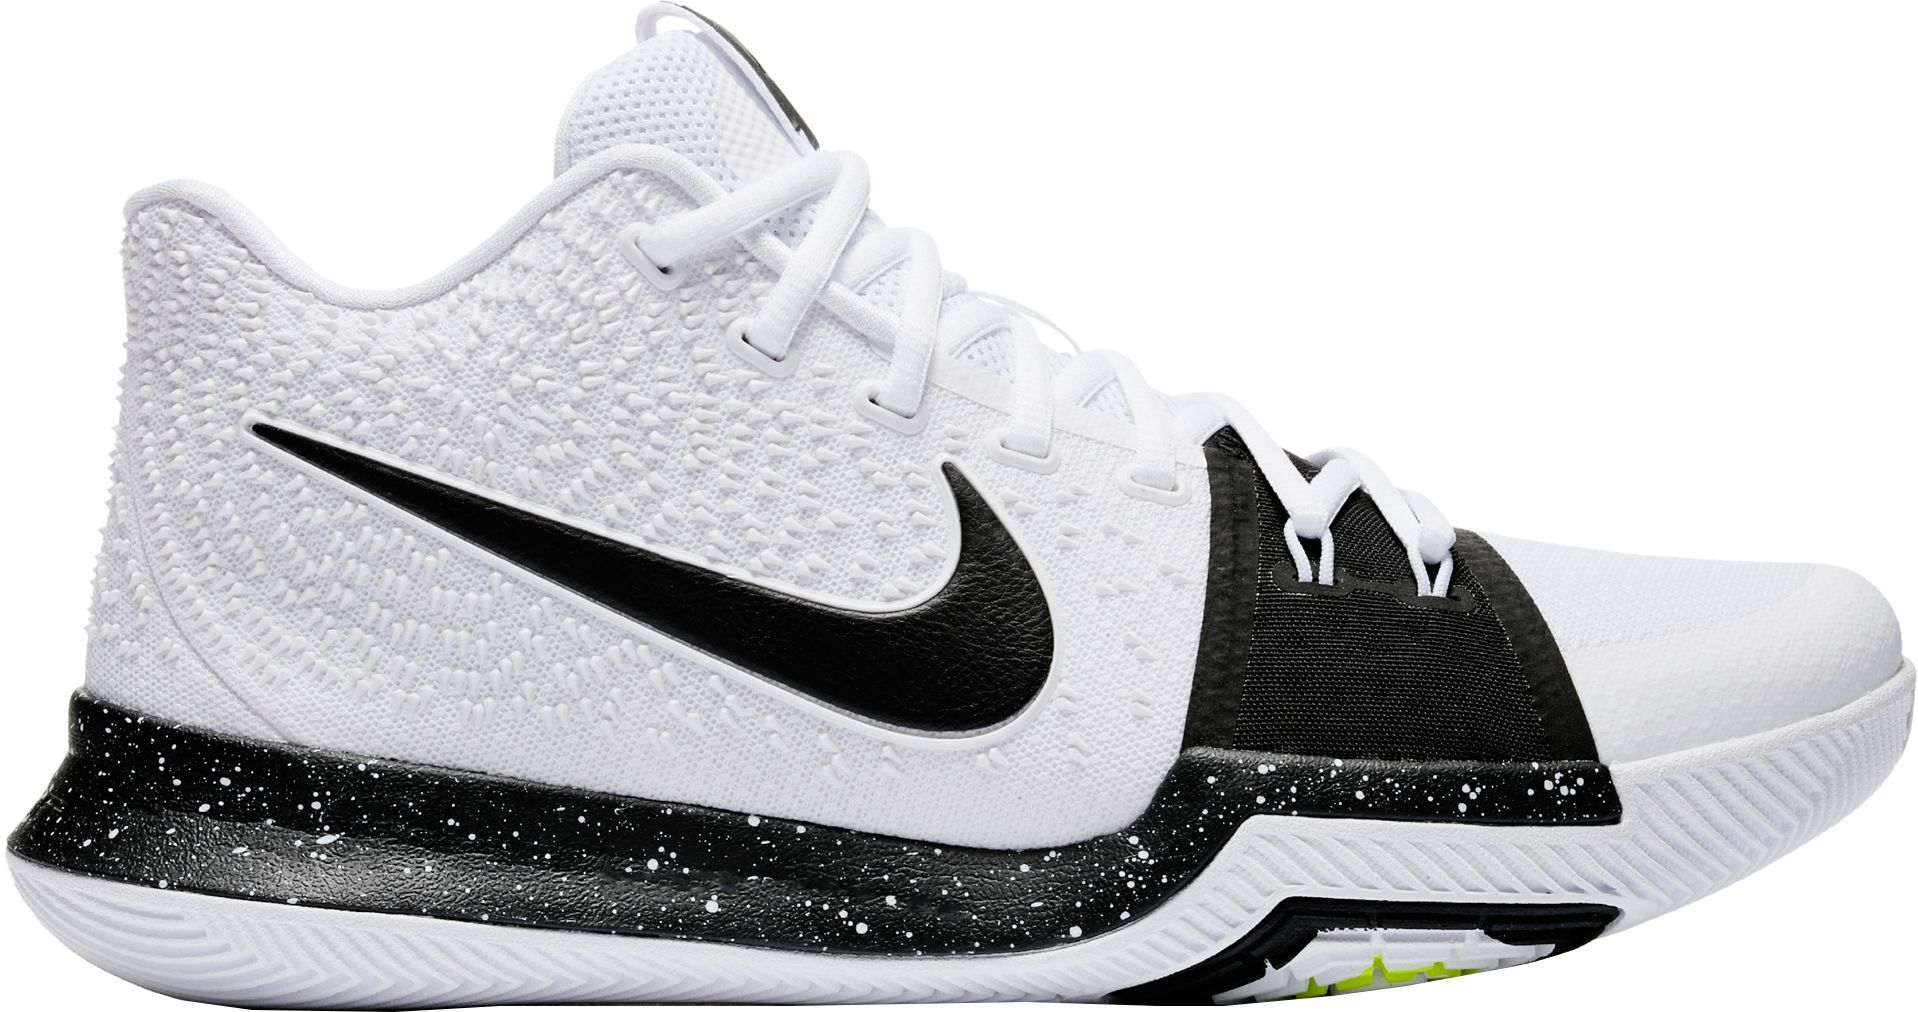 timeless design bd819 562d0 Nike Men's Kyrie 3 TB Basketball Shoes, Size: 14.0, White ...